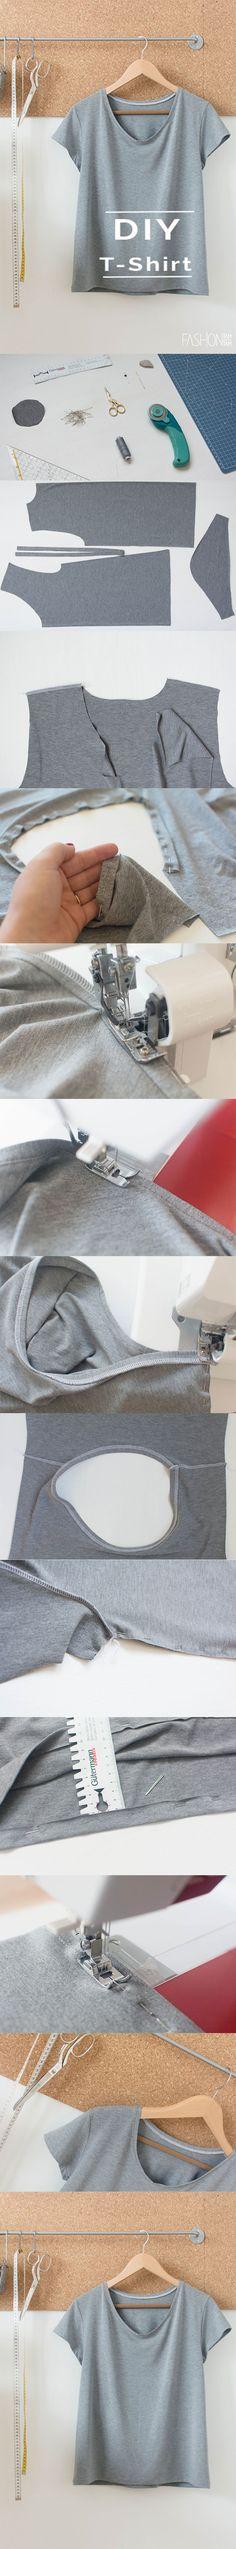 DIY FASHION ^ DIY T-SHIRT ^ SELFMADEFASHION ^ T-SHIRT NÄHEN (Diy Clothes)